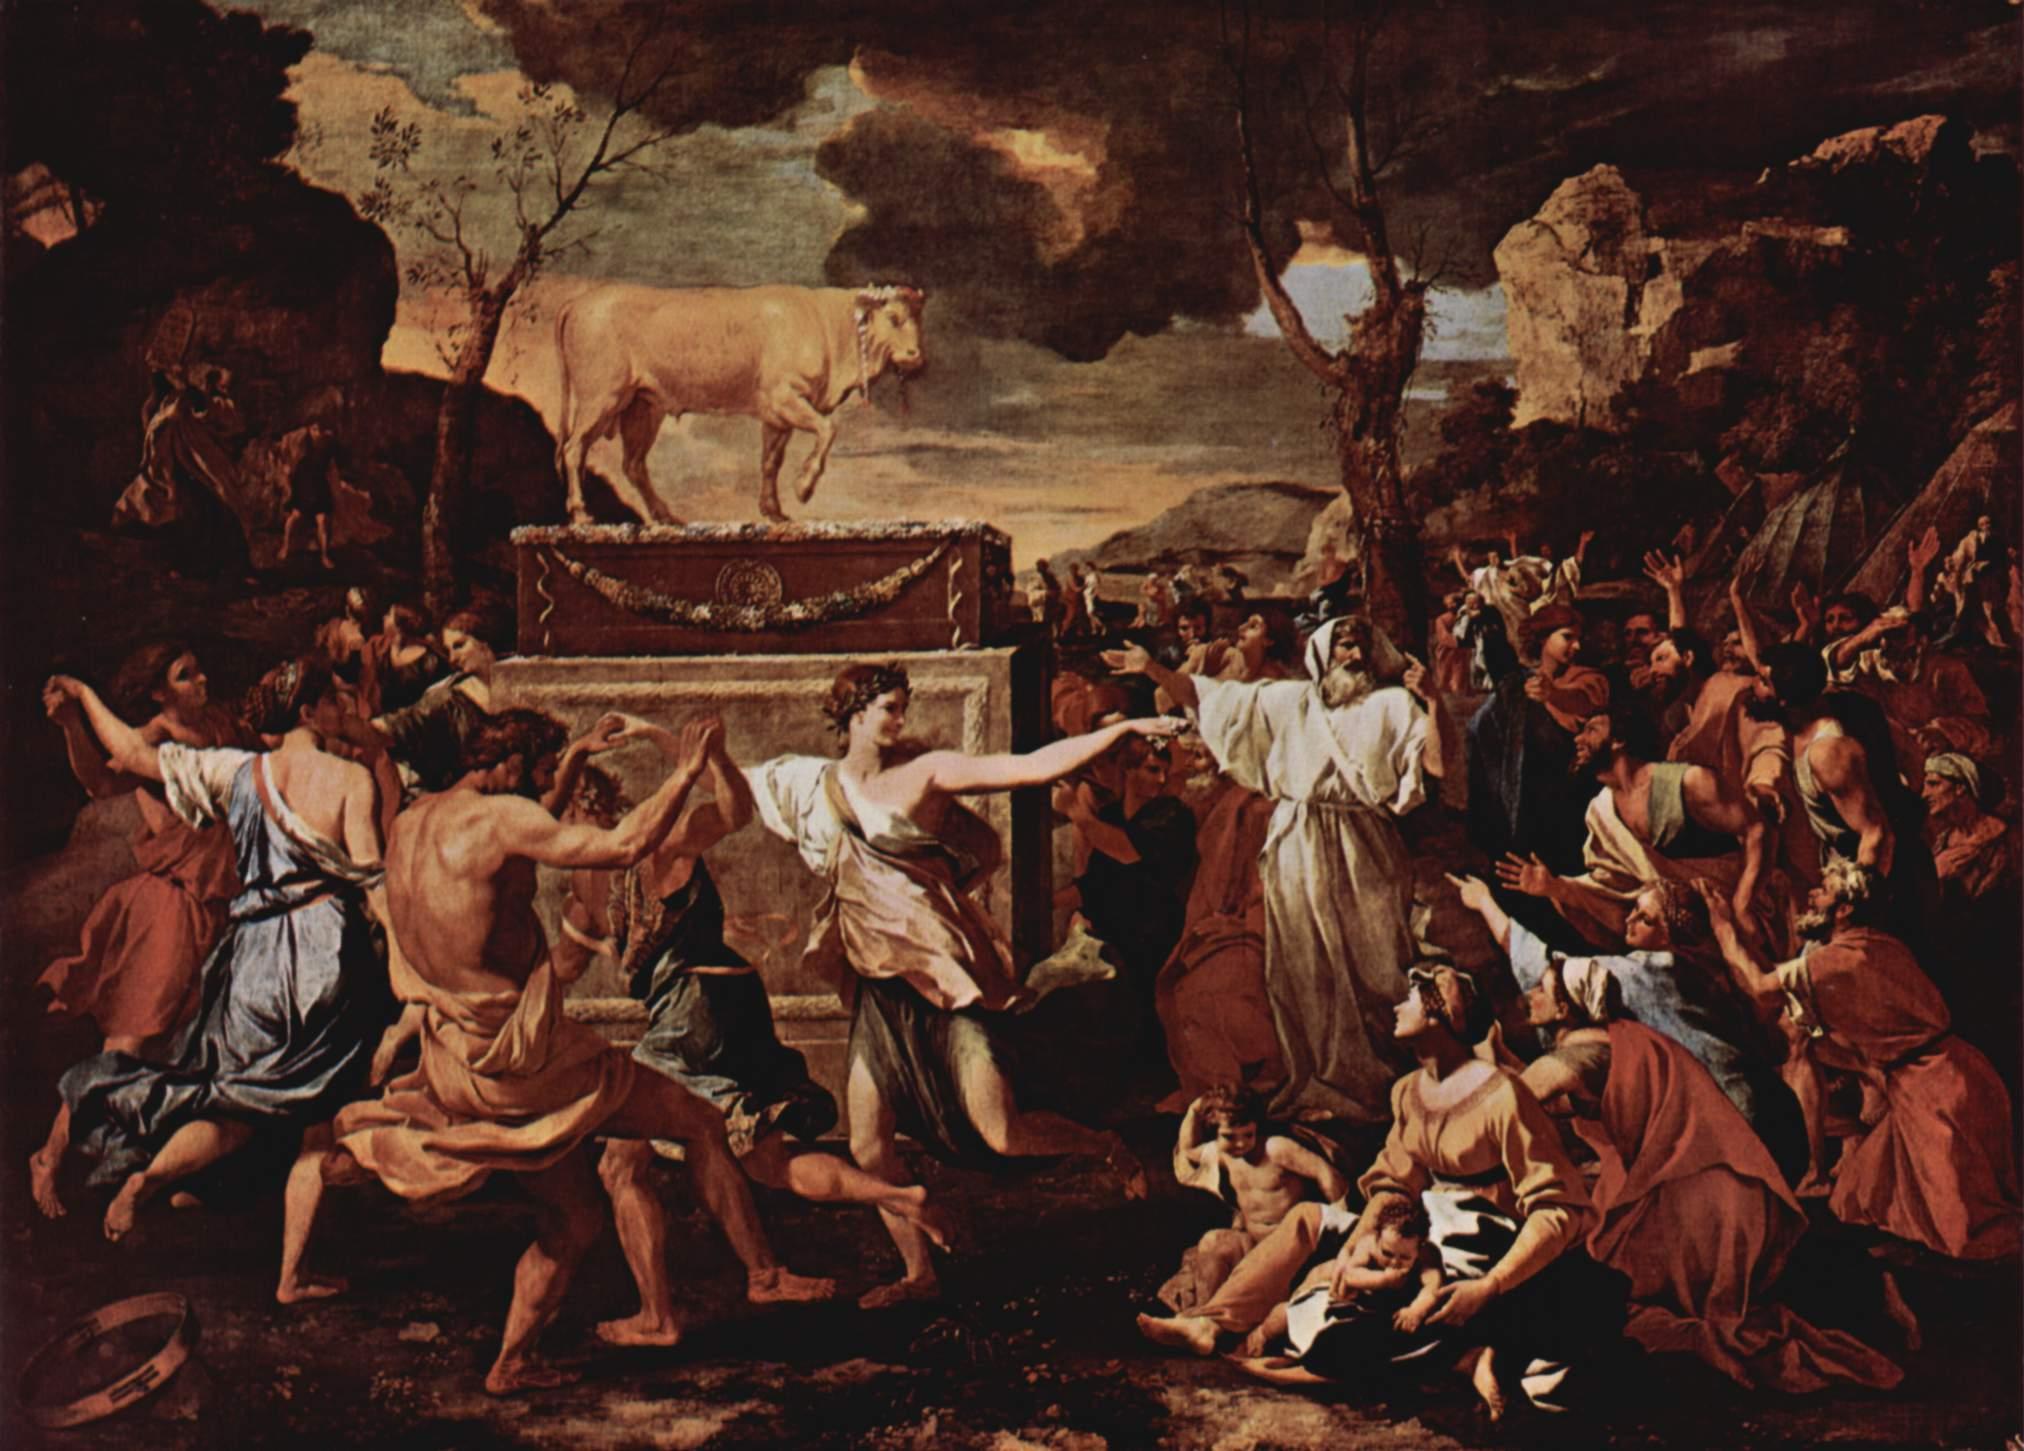 File:Nicolas Poussin - The Adoration of the Golden Calf alt.jpg